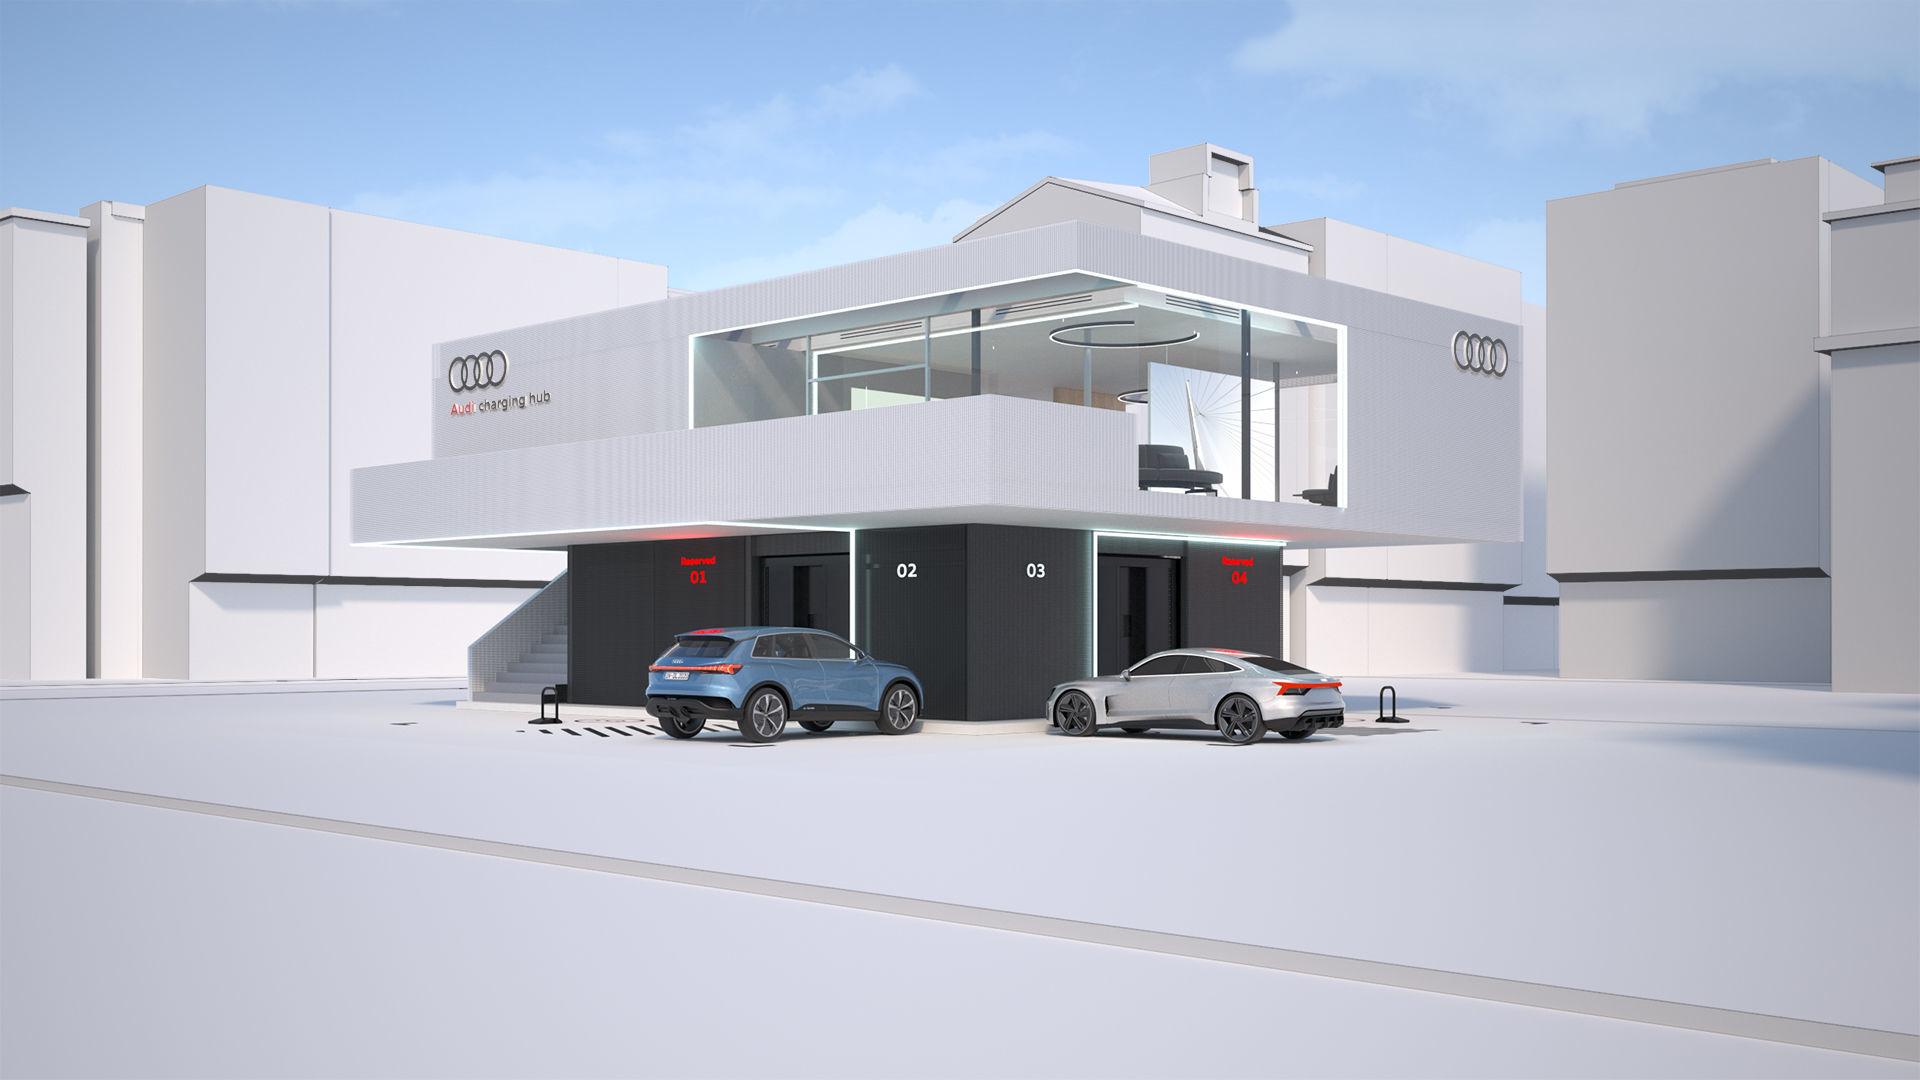 Audi pilots concept for quick charging - Image 1